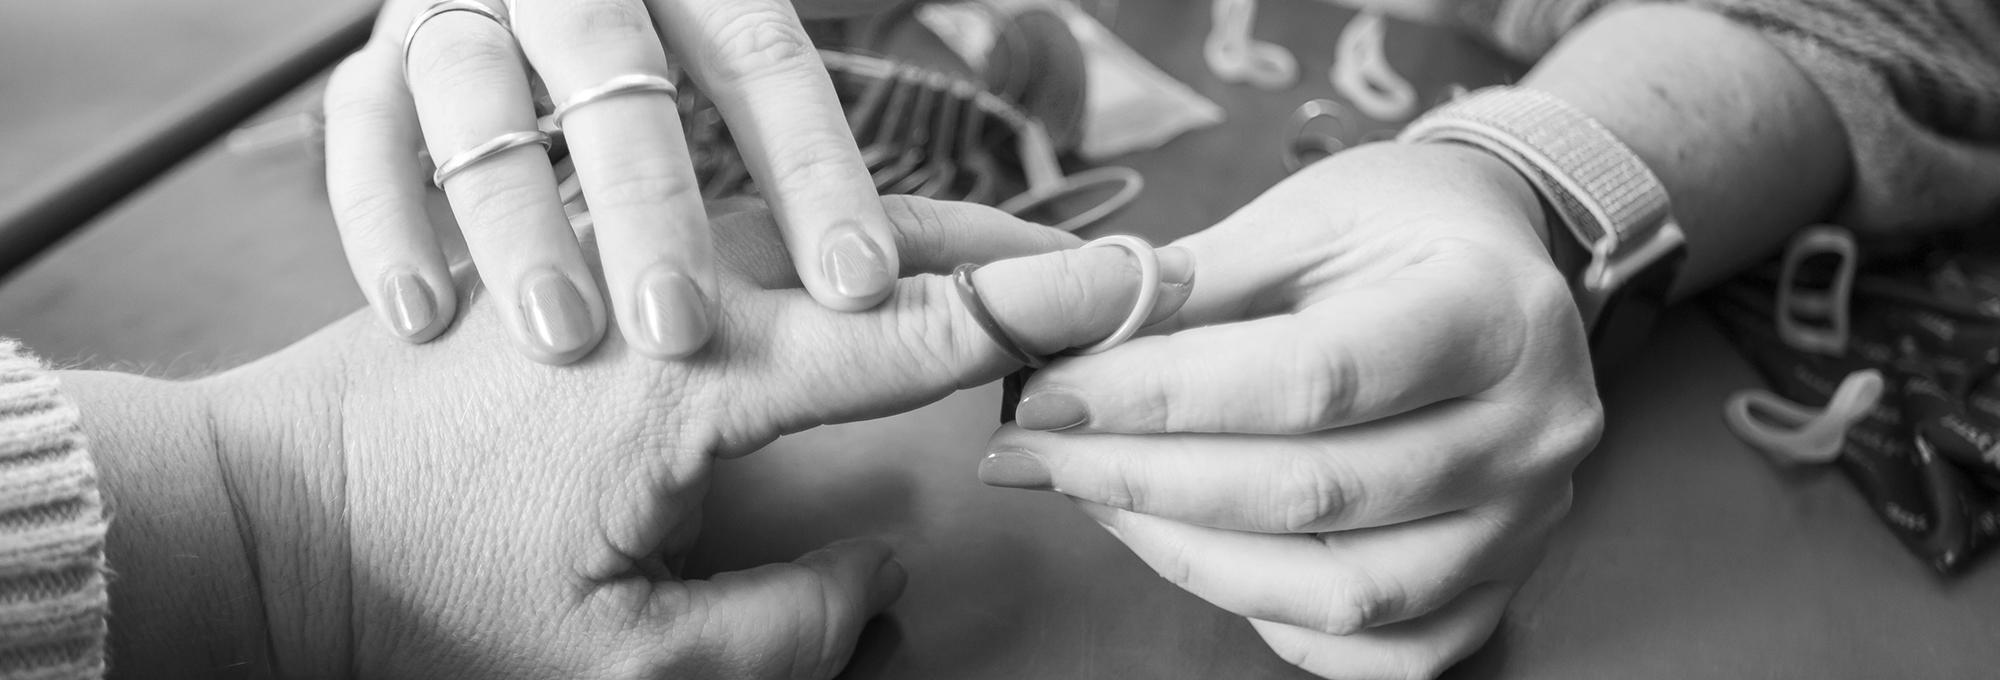 michelle-osullivan-ring-splinting